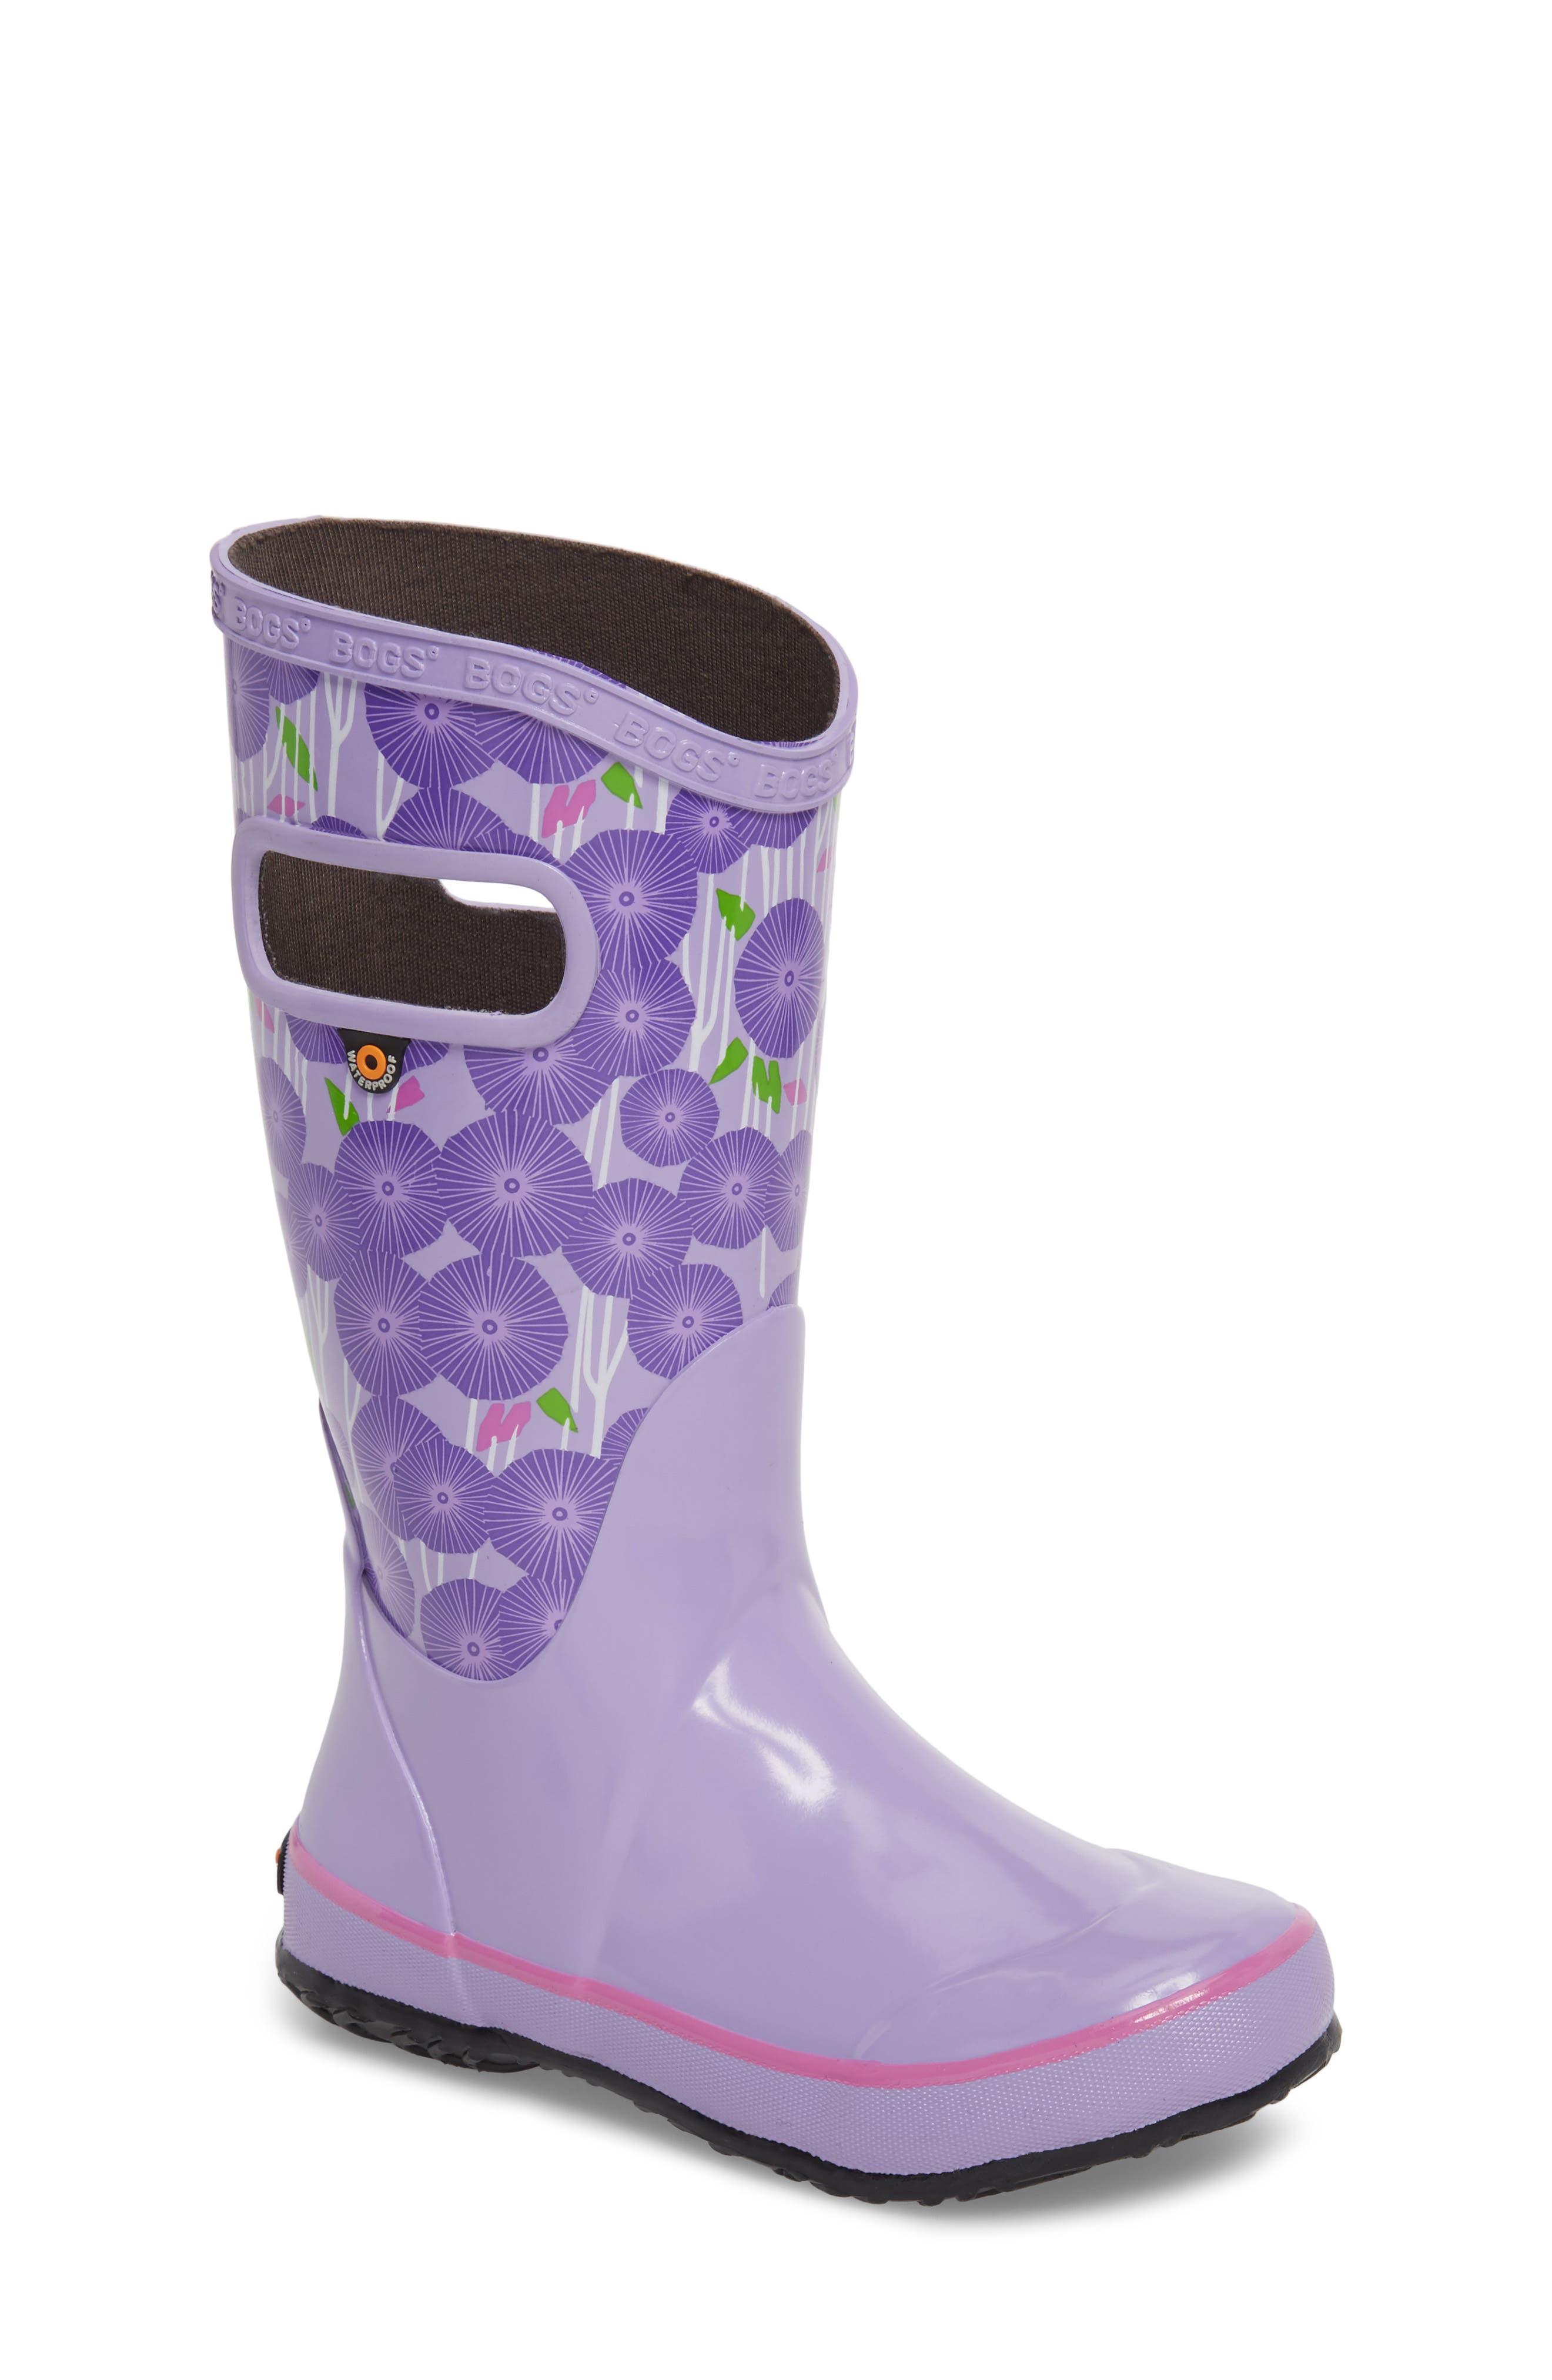 BOGS Skipper Aster Print Rubber Rain Boot, Main, color, LAVENDER MULTI